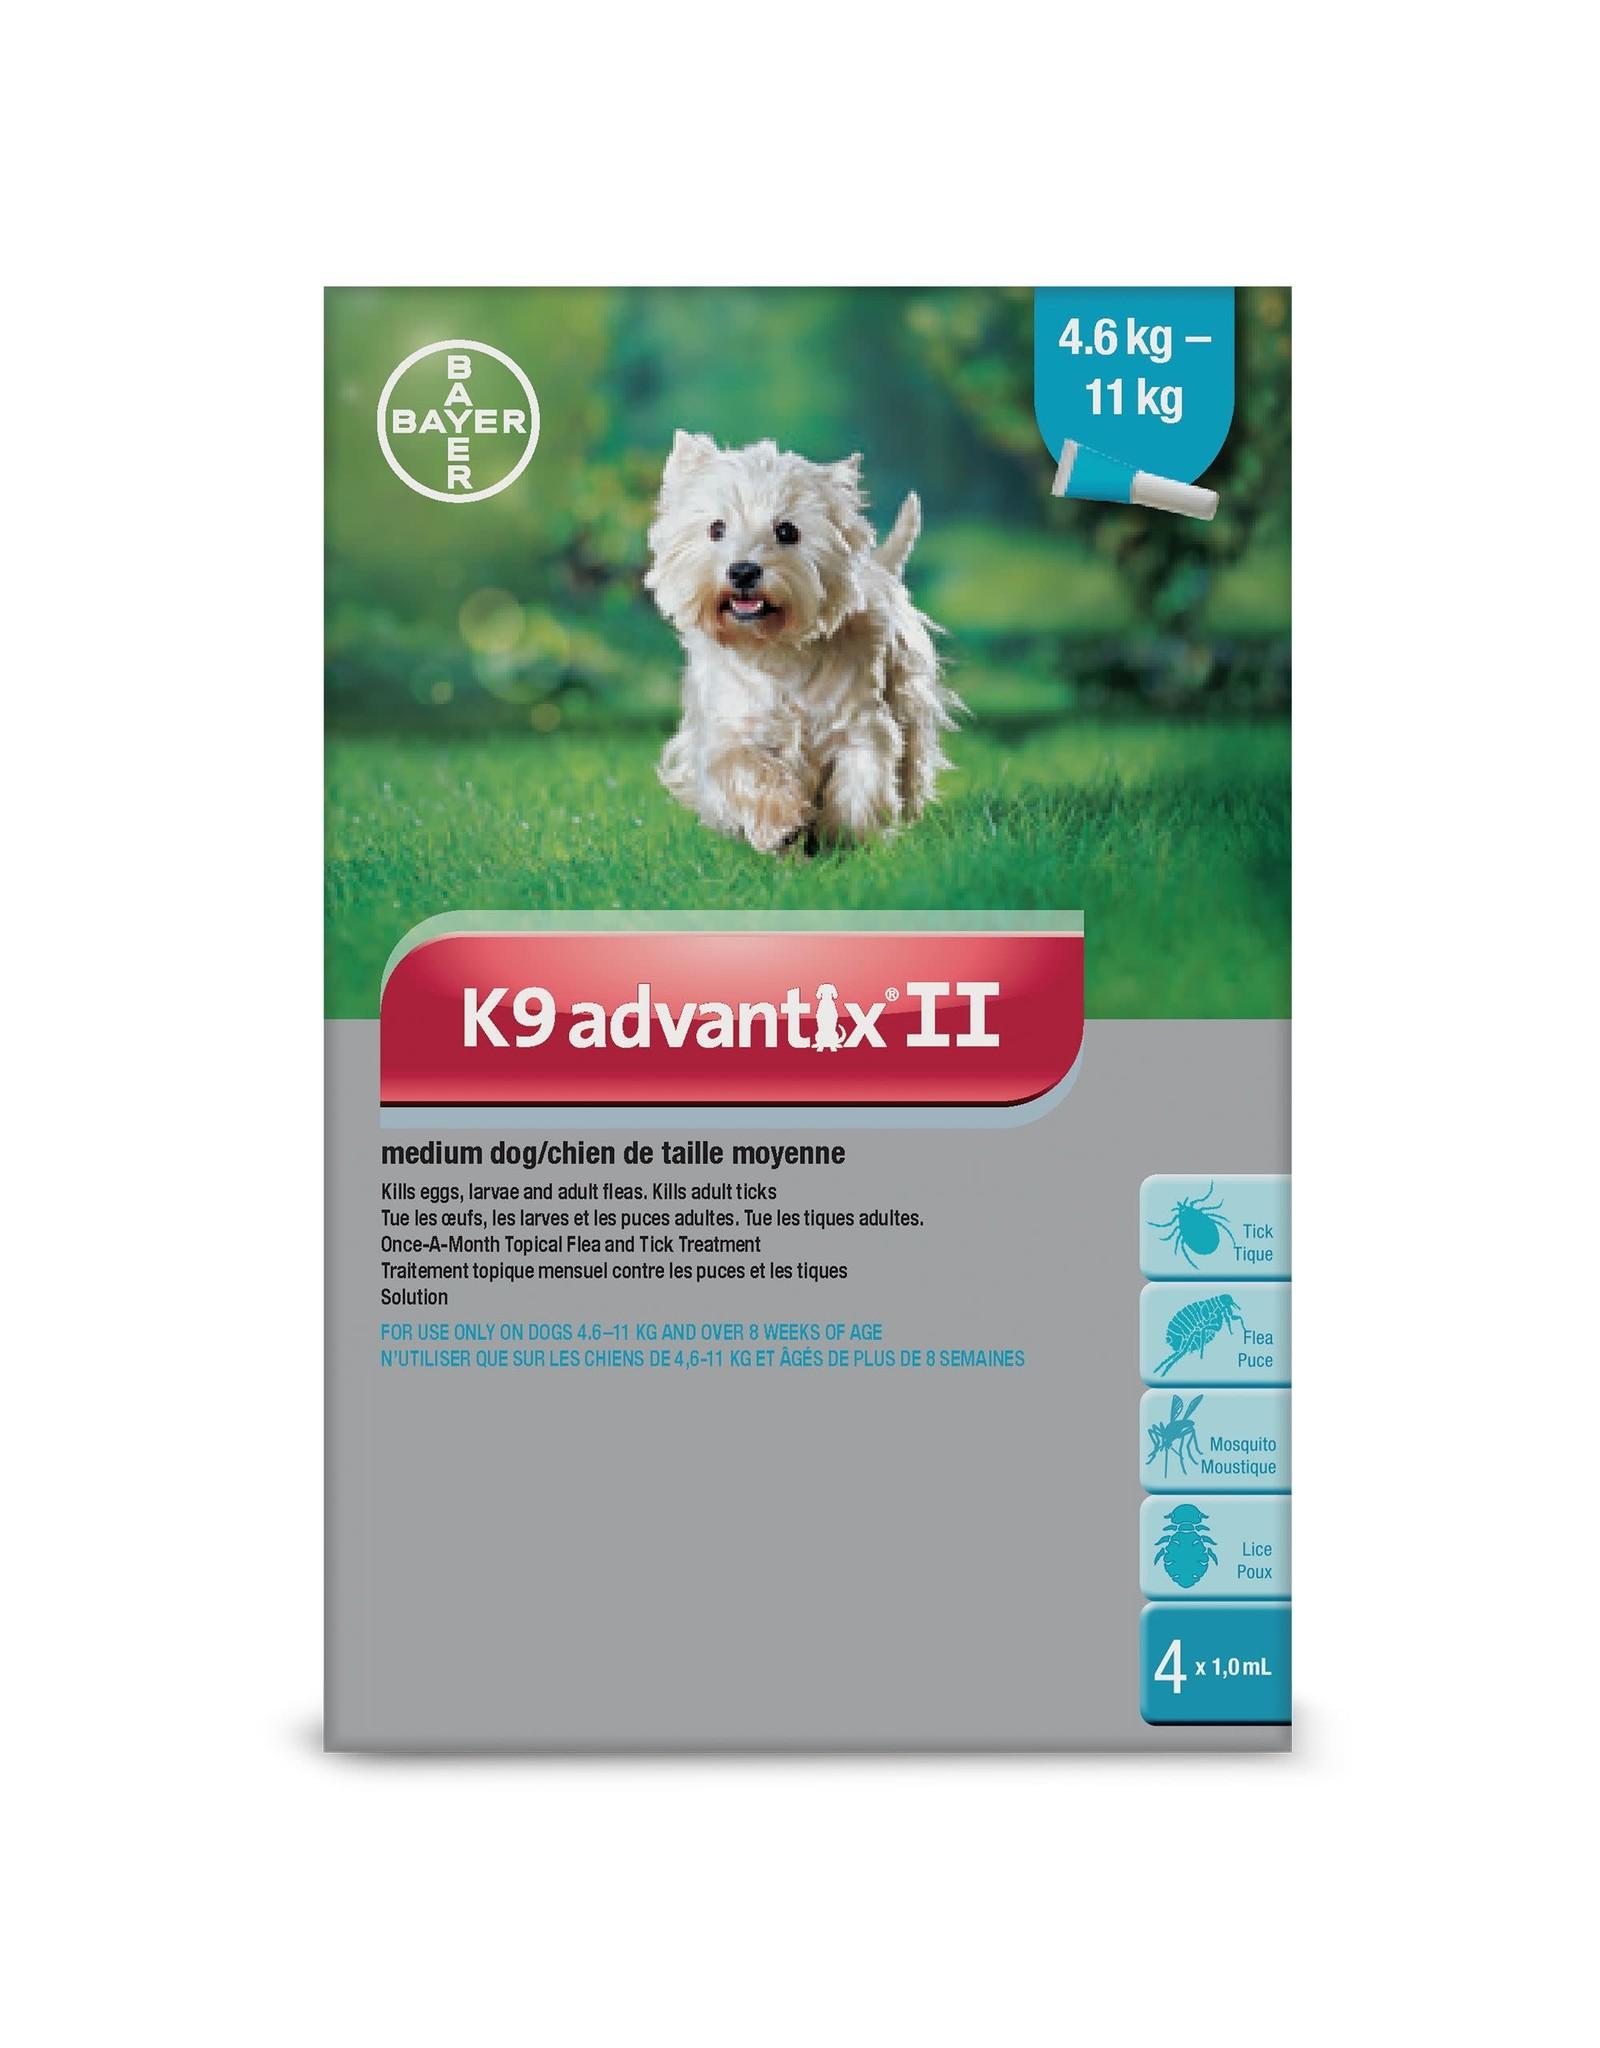 Bayer K9 Advantix II - 4.6kg - 11kg, 4 doses